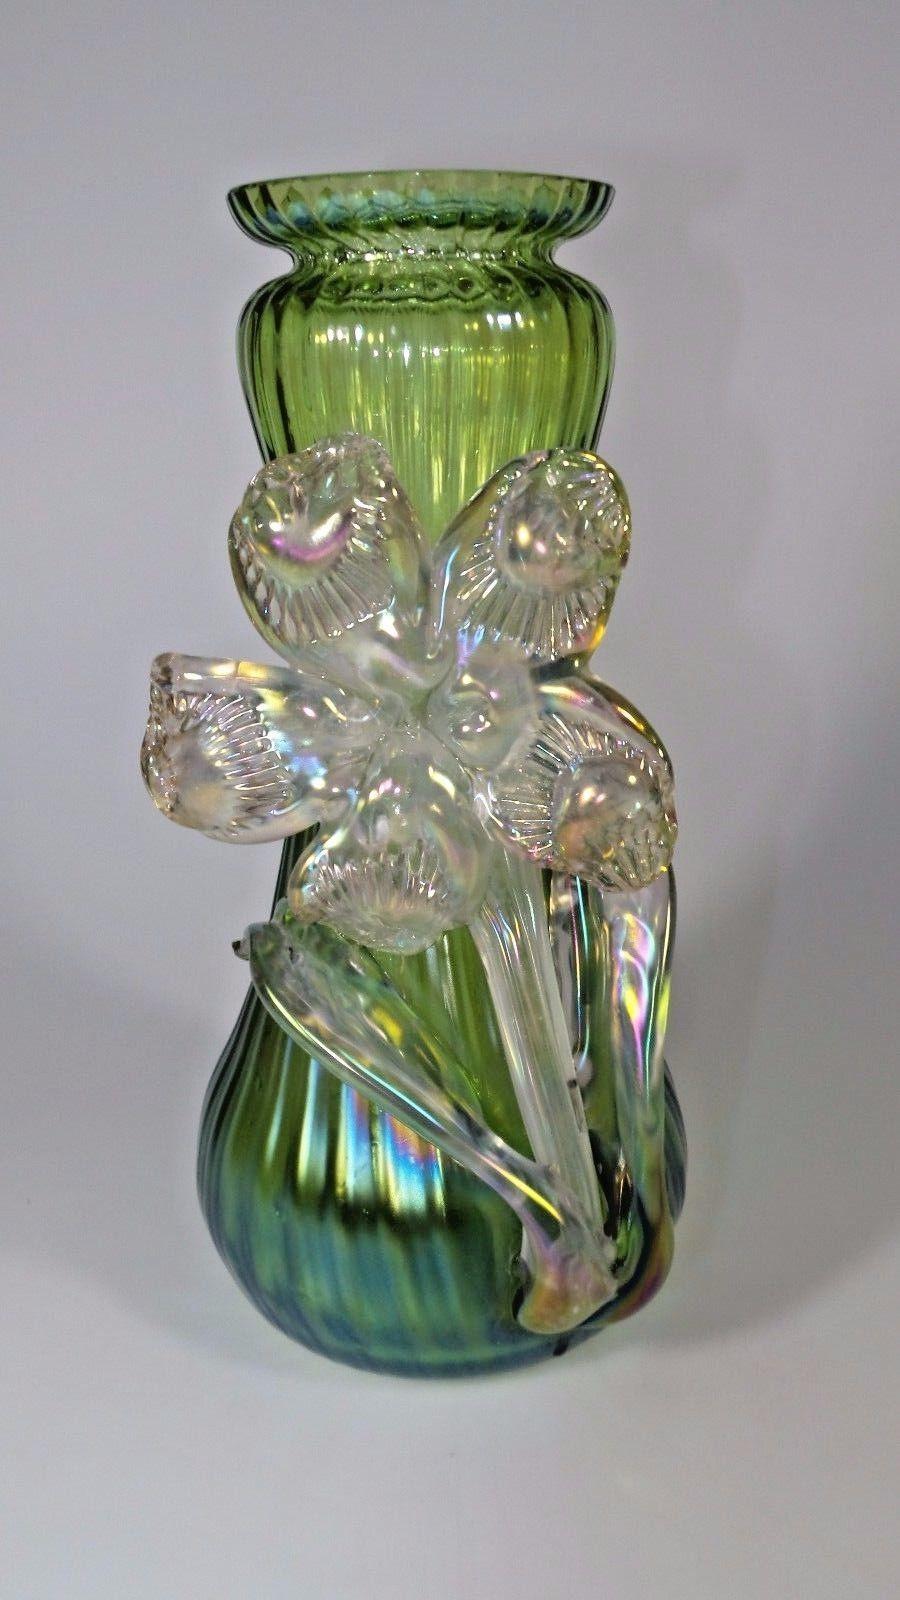 murano blown glass vase of vintage blown glass vase pictures vintage art nouveau kralik green regarding vintage art nouveau kralik green iridescent art glass vase w applied